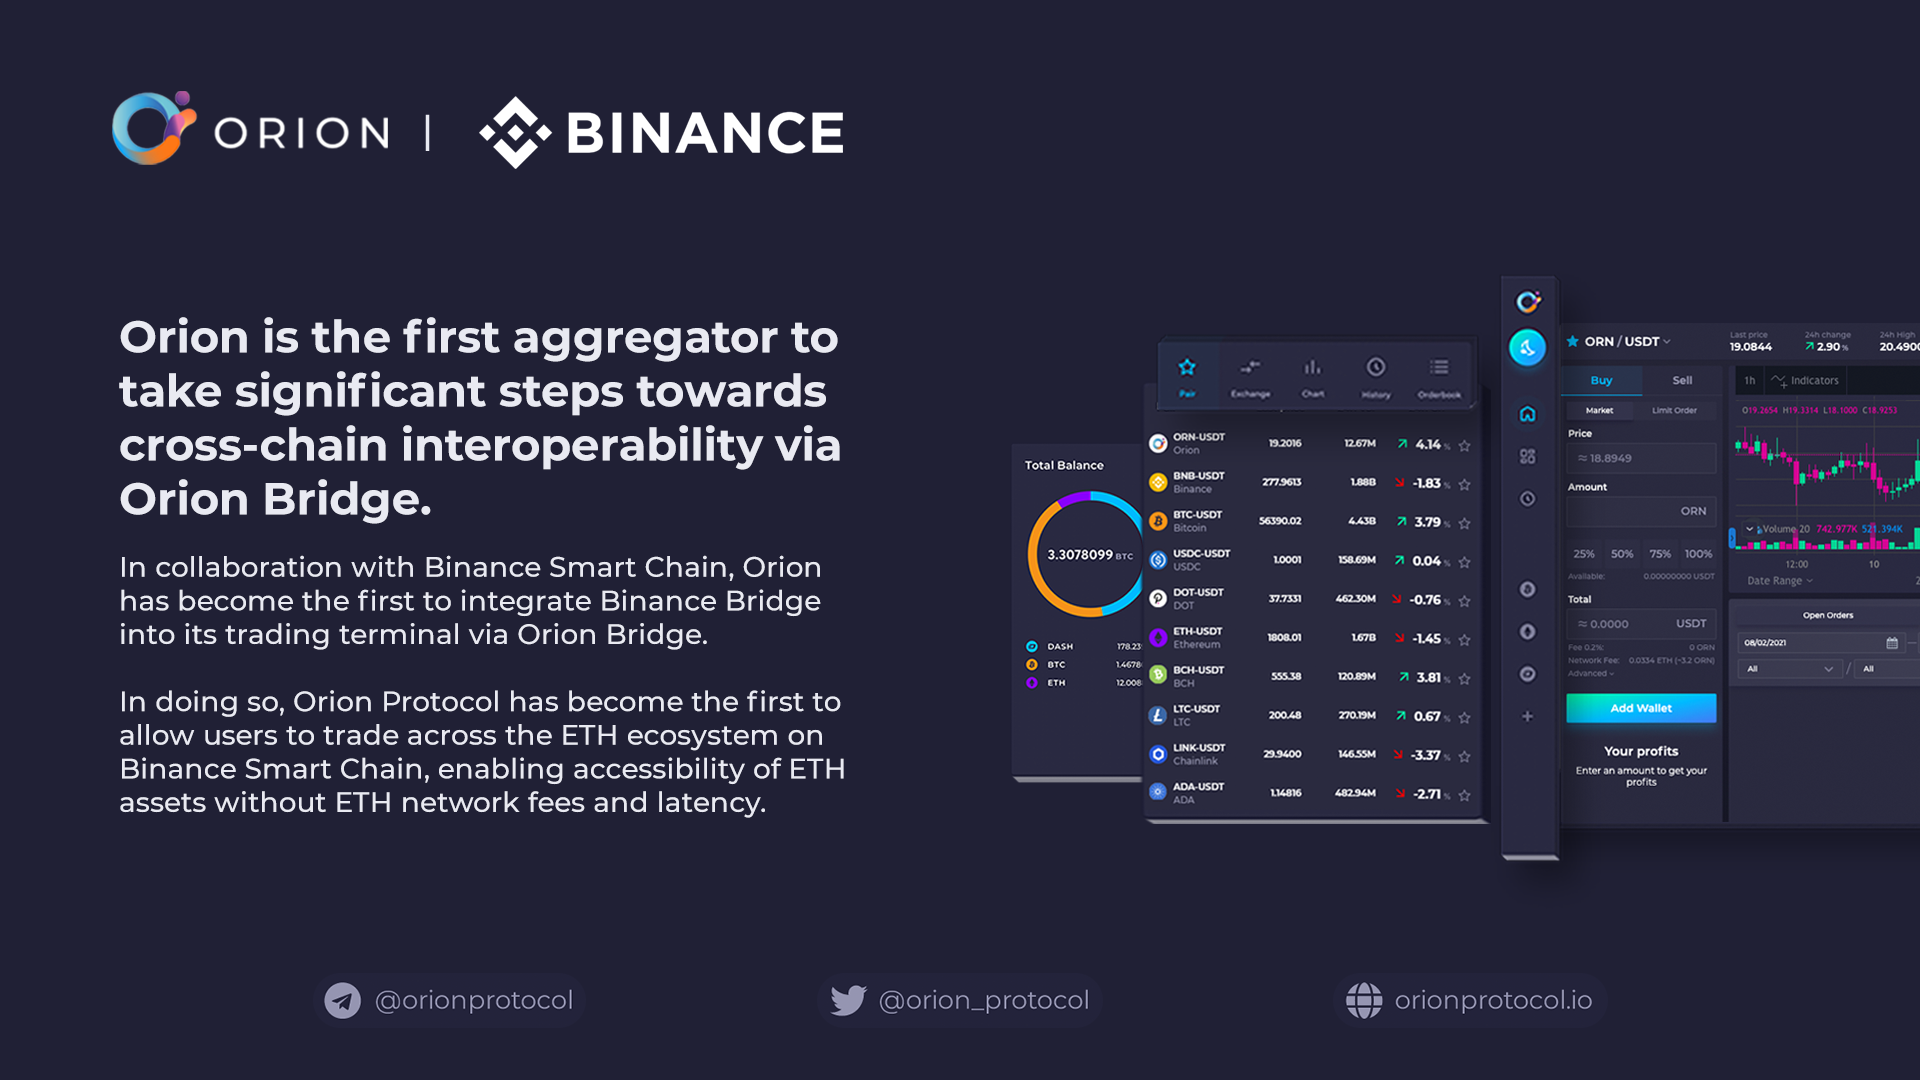 Orion Bridge integrates Binance Bridge